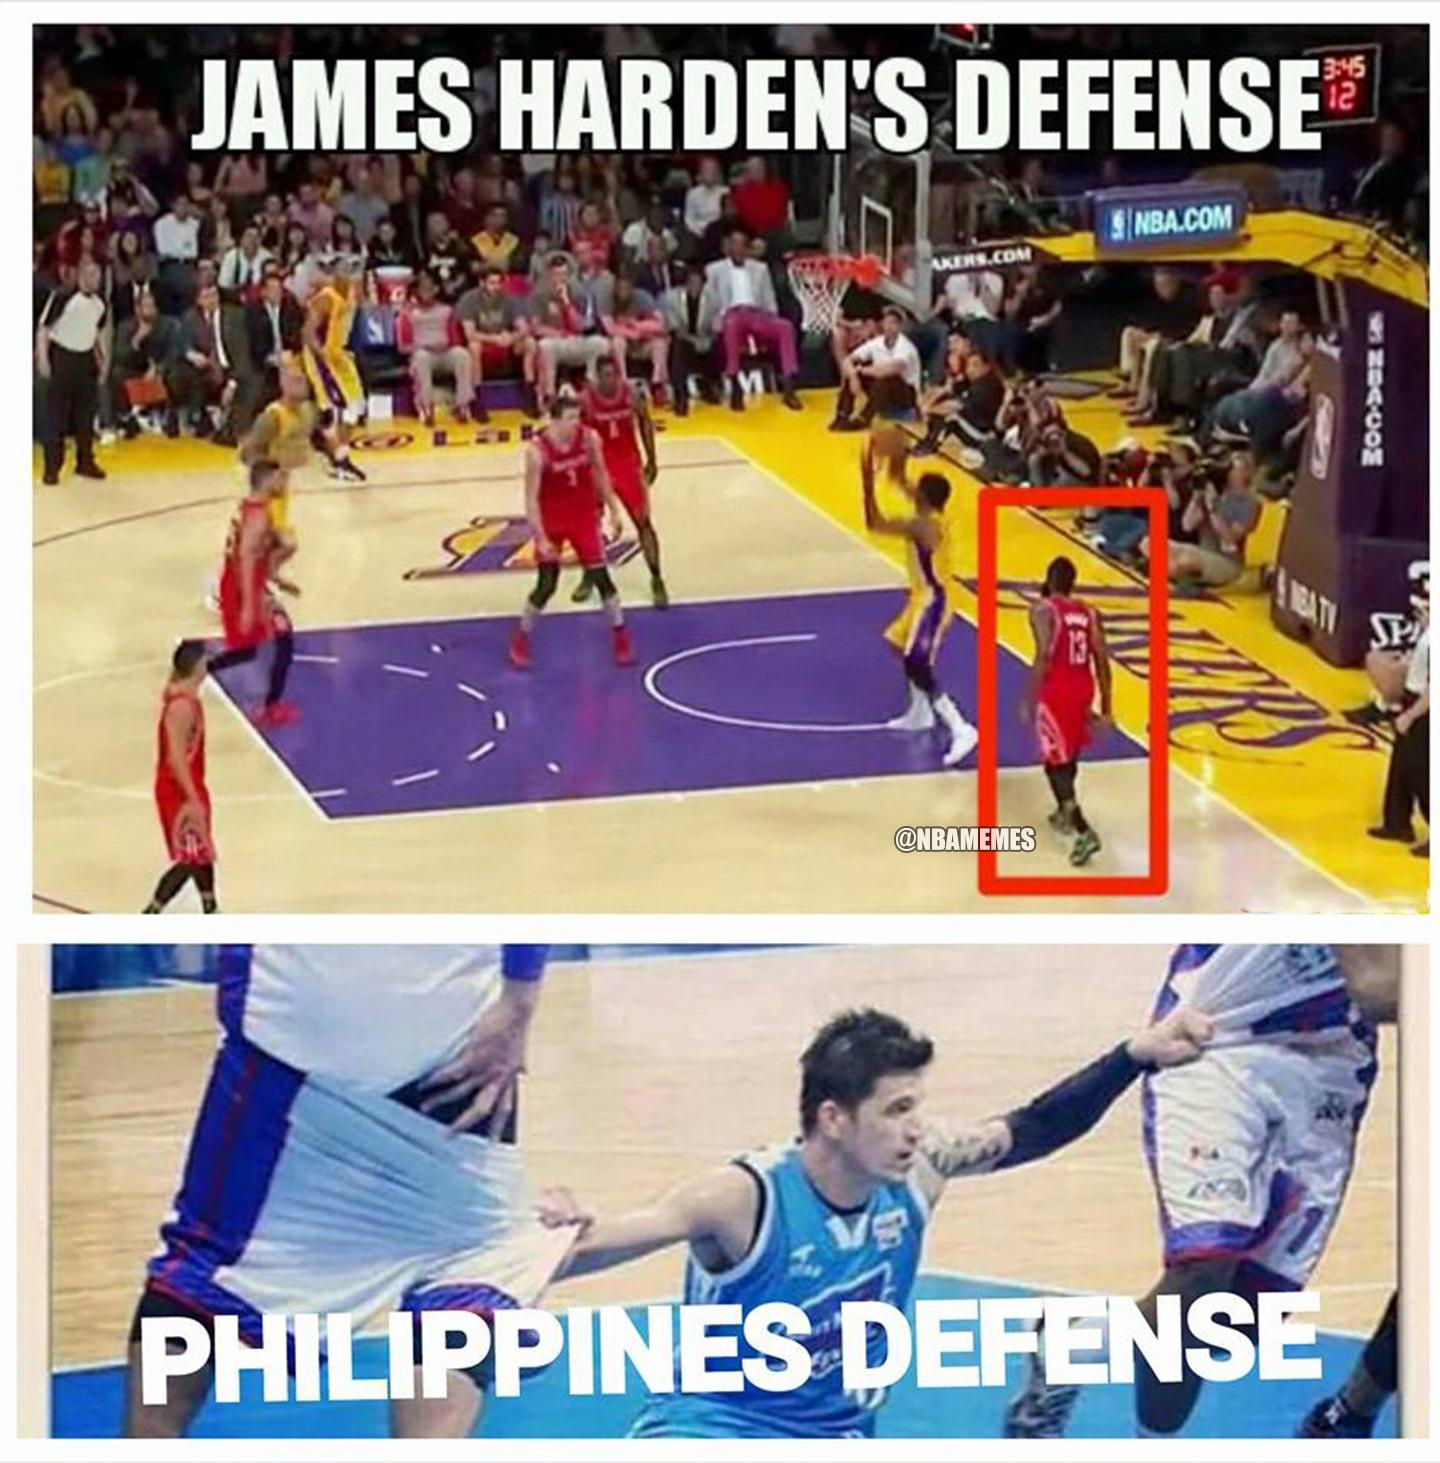 Nba memes on twitter quot james harden vs philippines defense edition